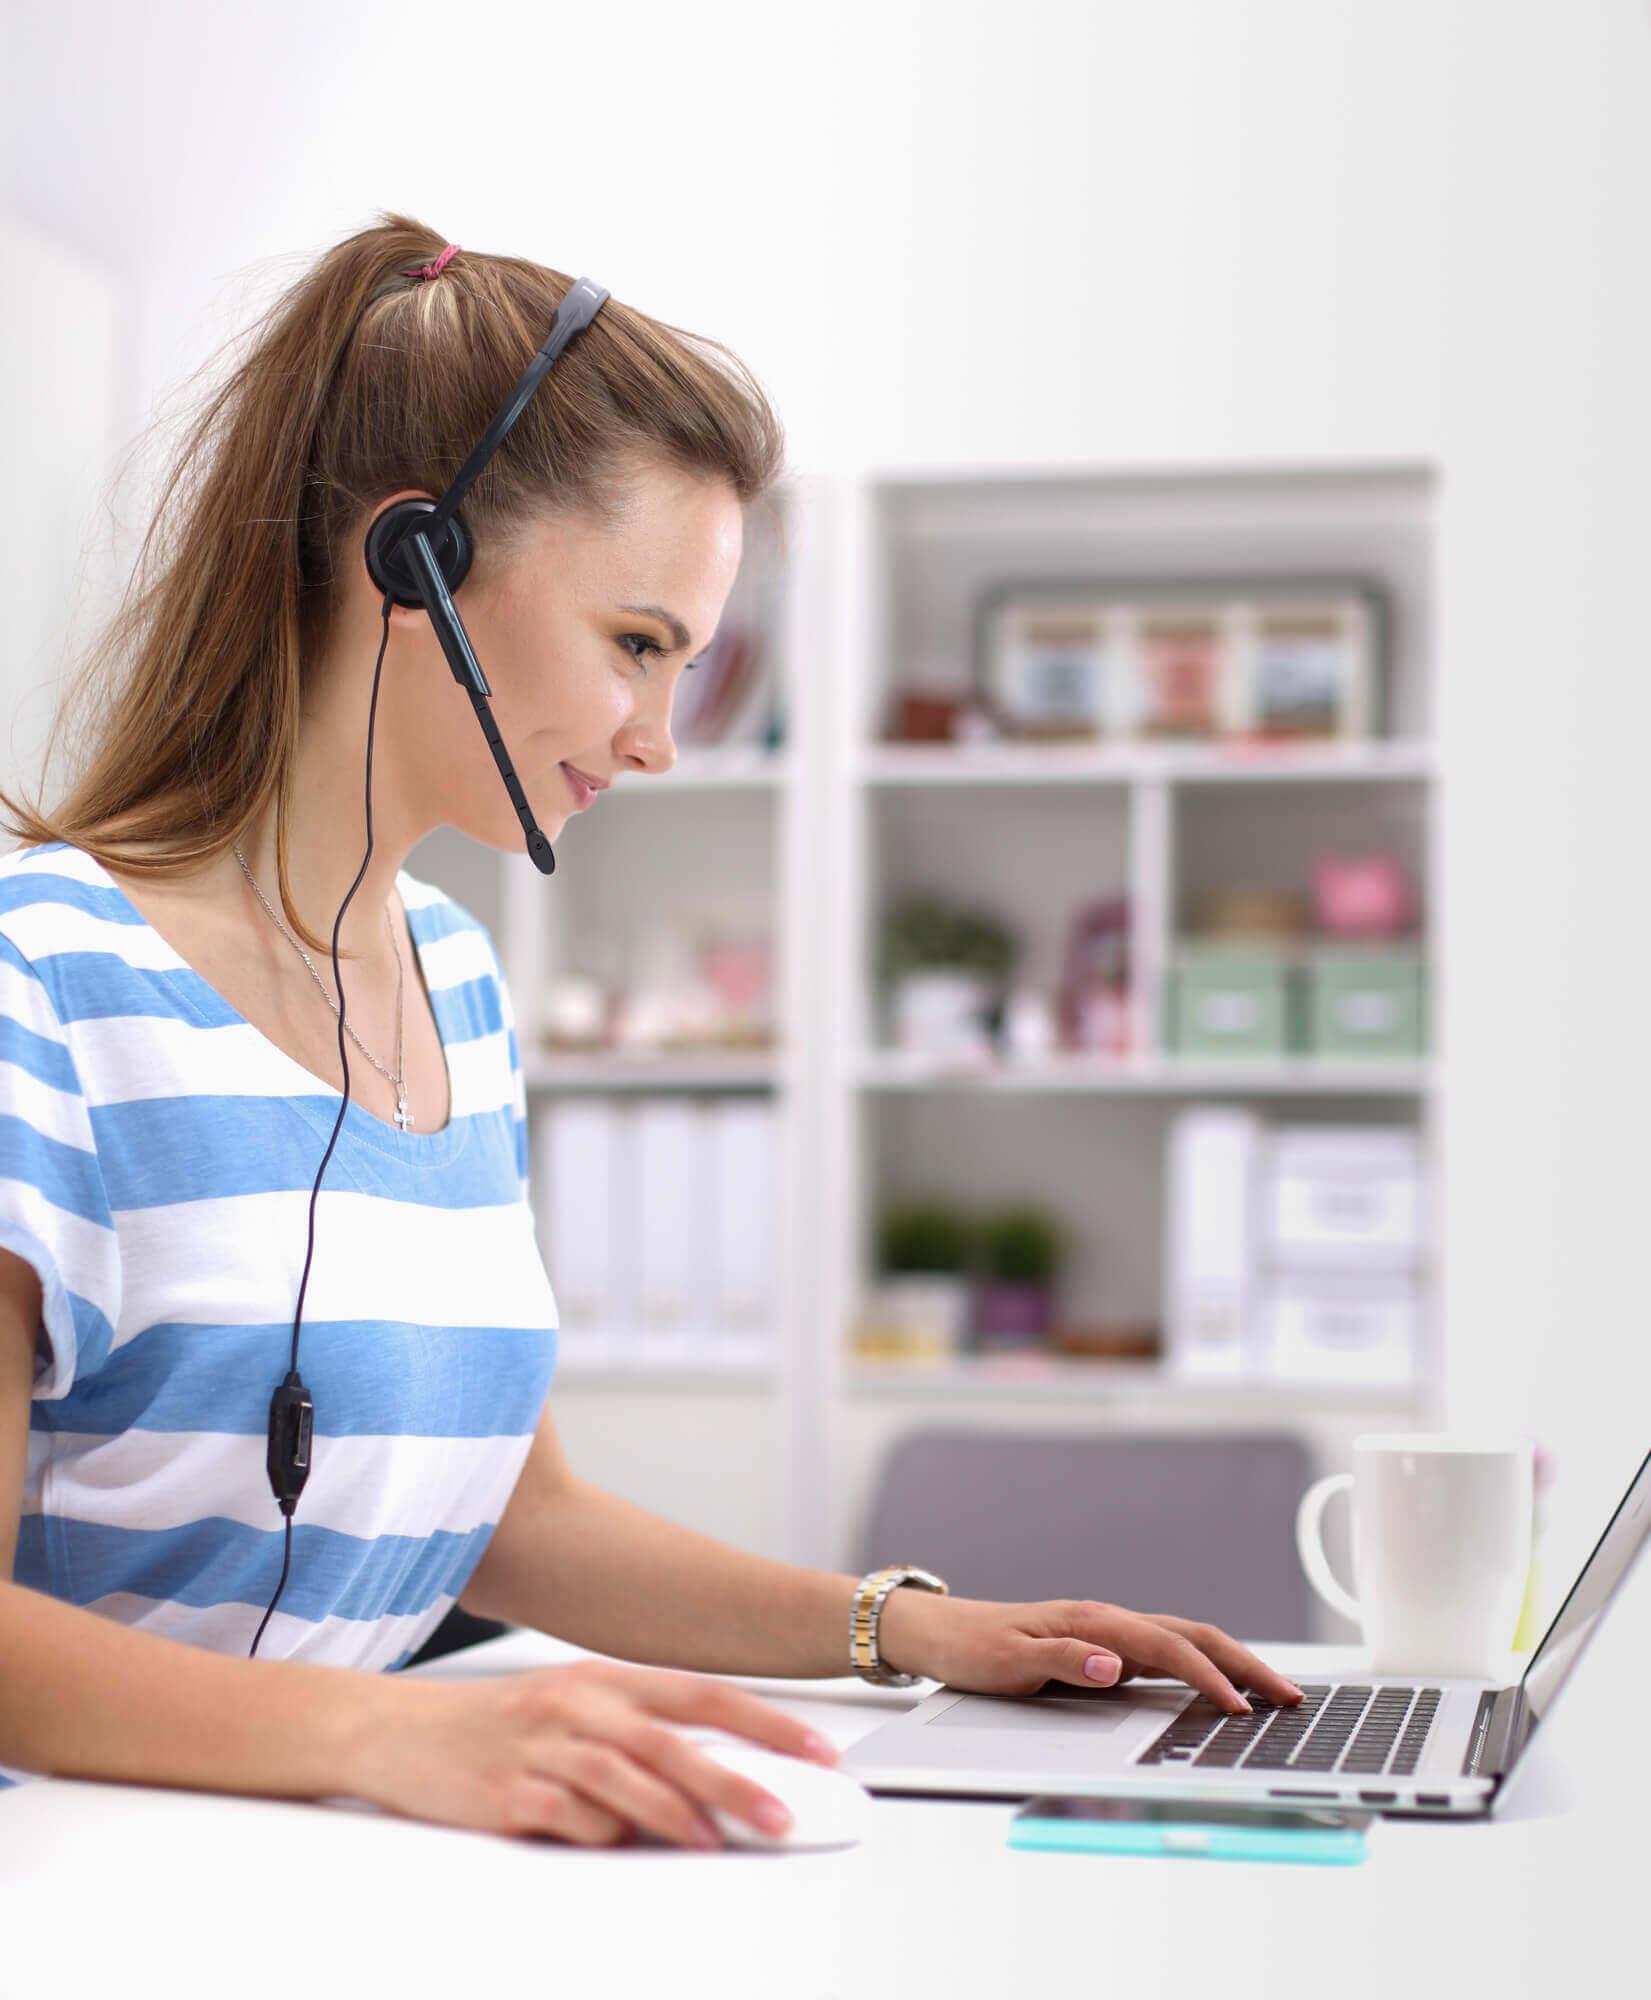 Virtueller Assistent im Kundensupport